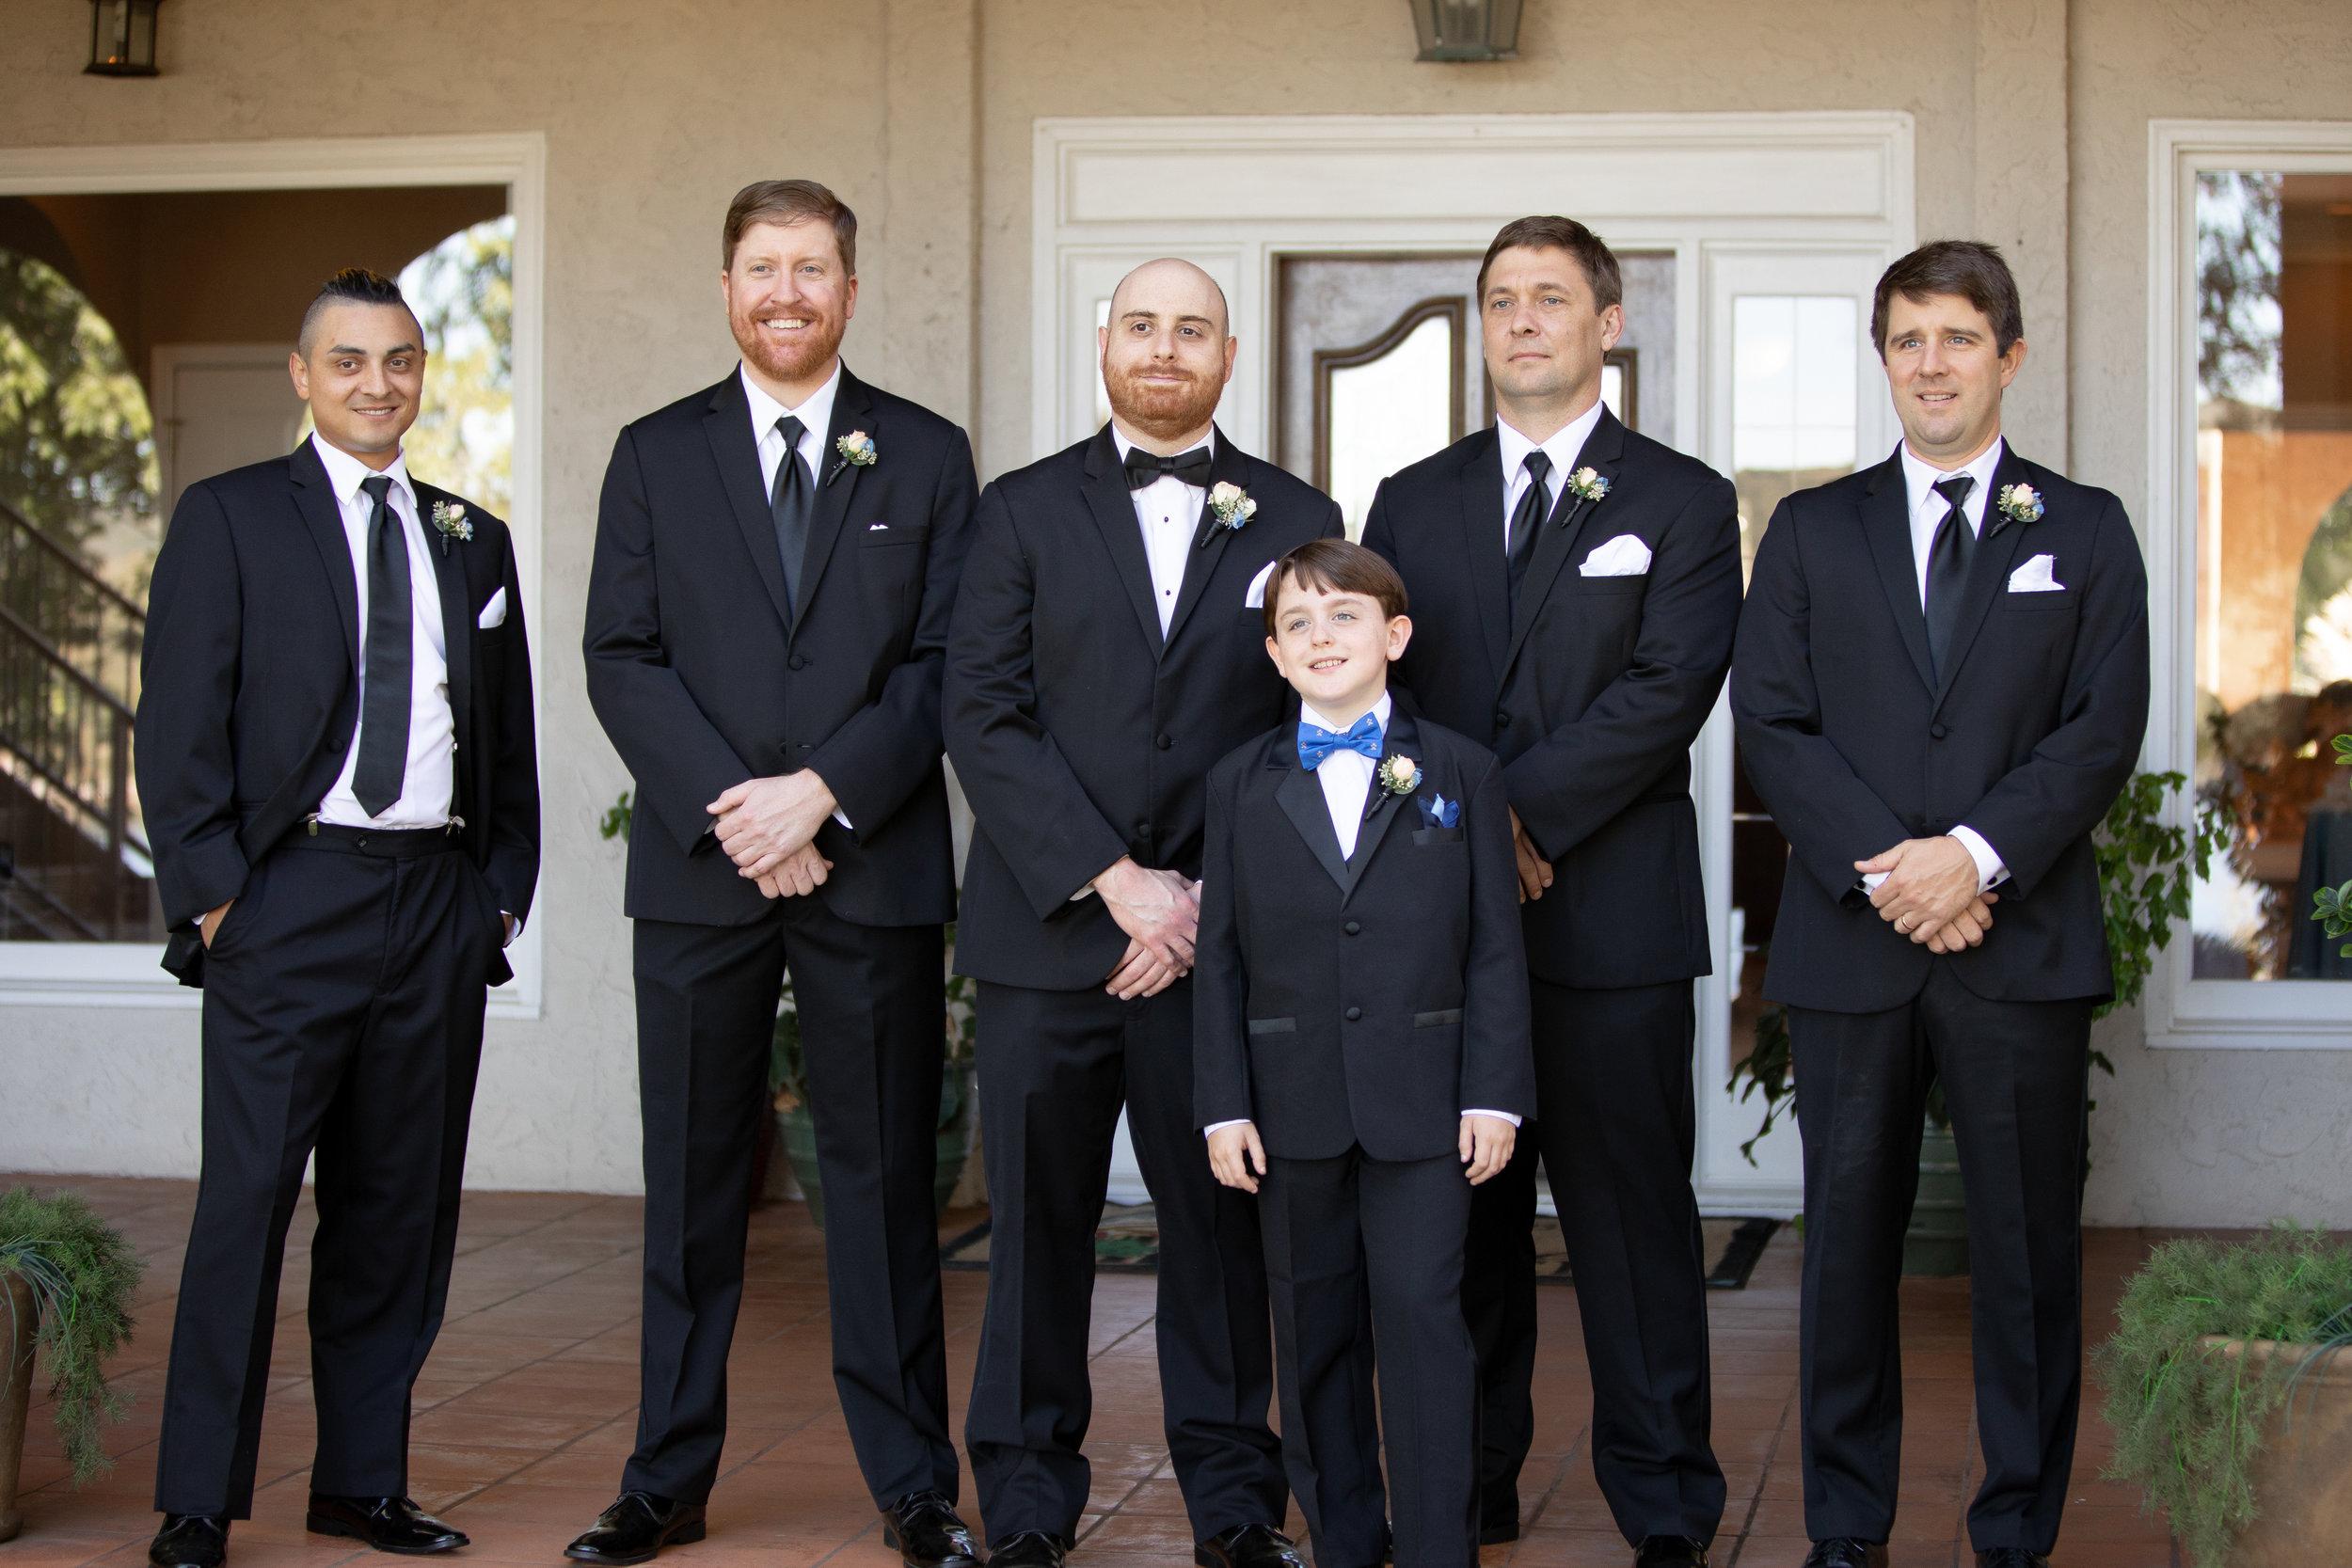 WEDDING-PARTY-037.jpg